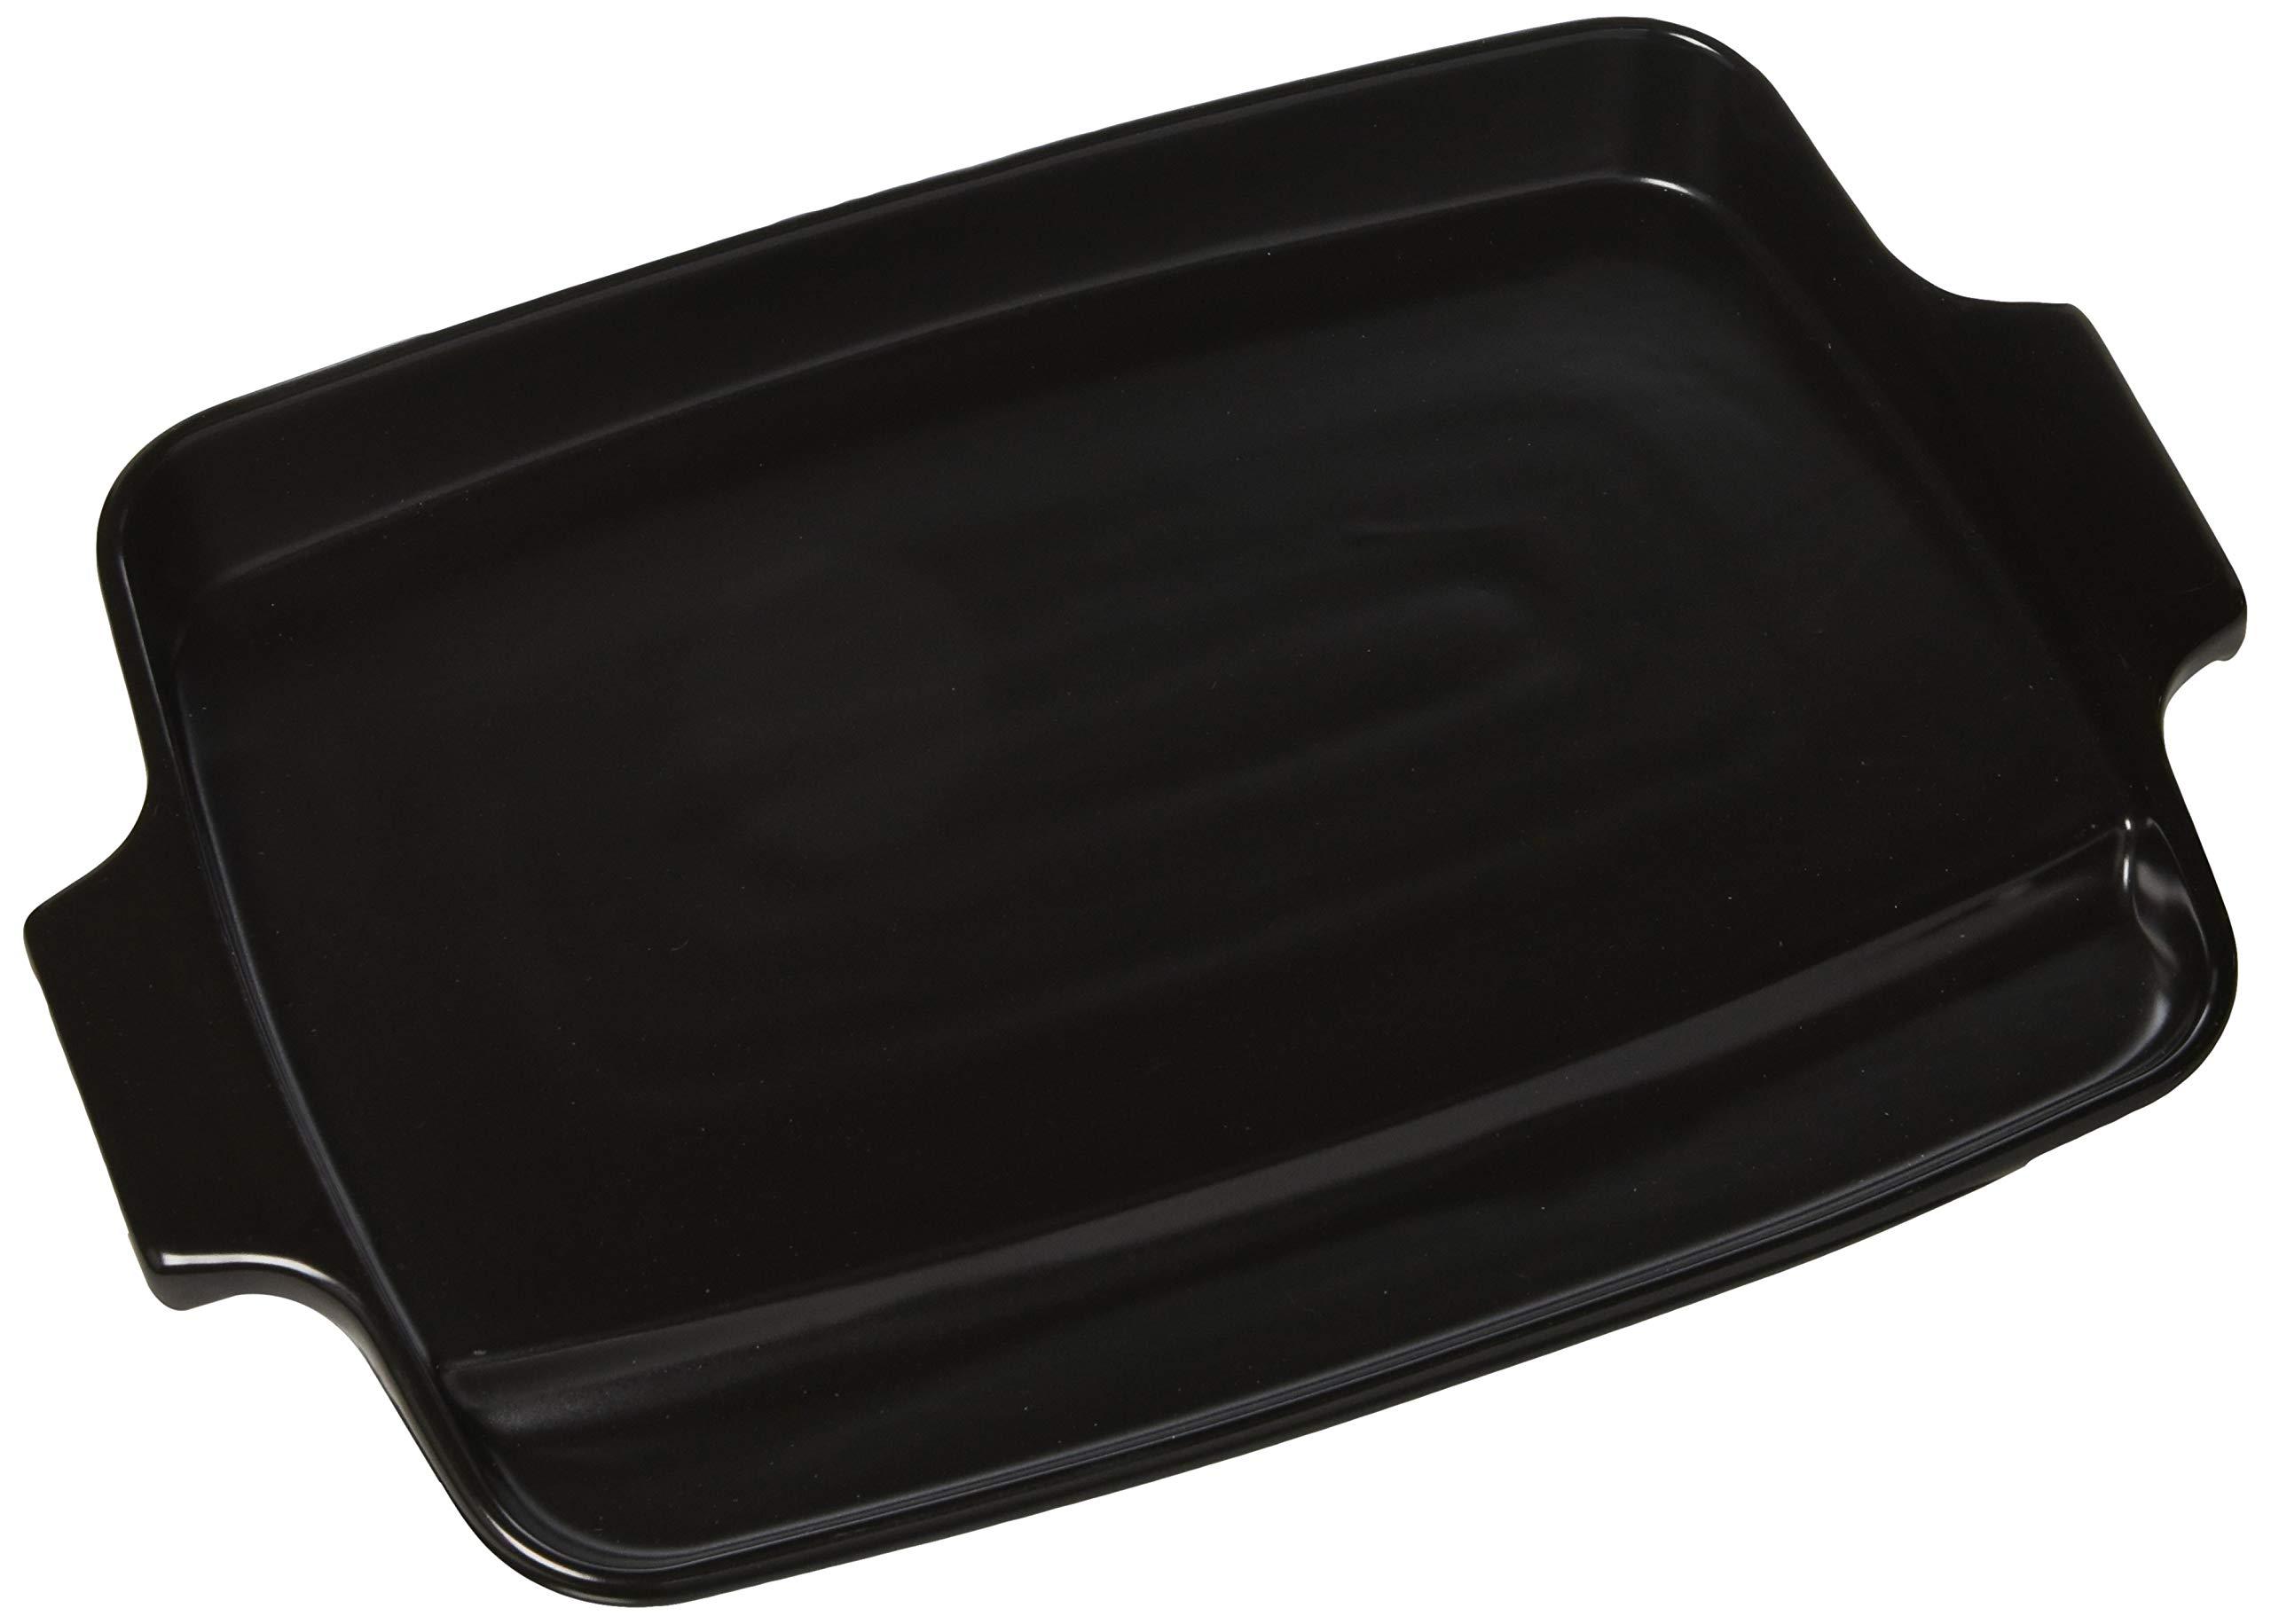 Charcoal Companion CC3813 Flame-Friendly Ceramic Plancha, 14.3'' x 9.4'' x 2.5'', Black